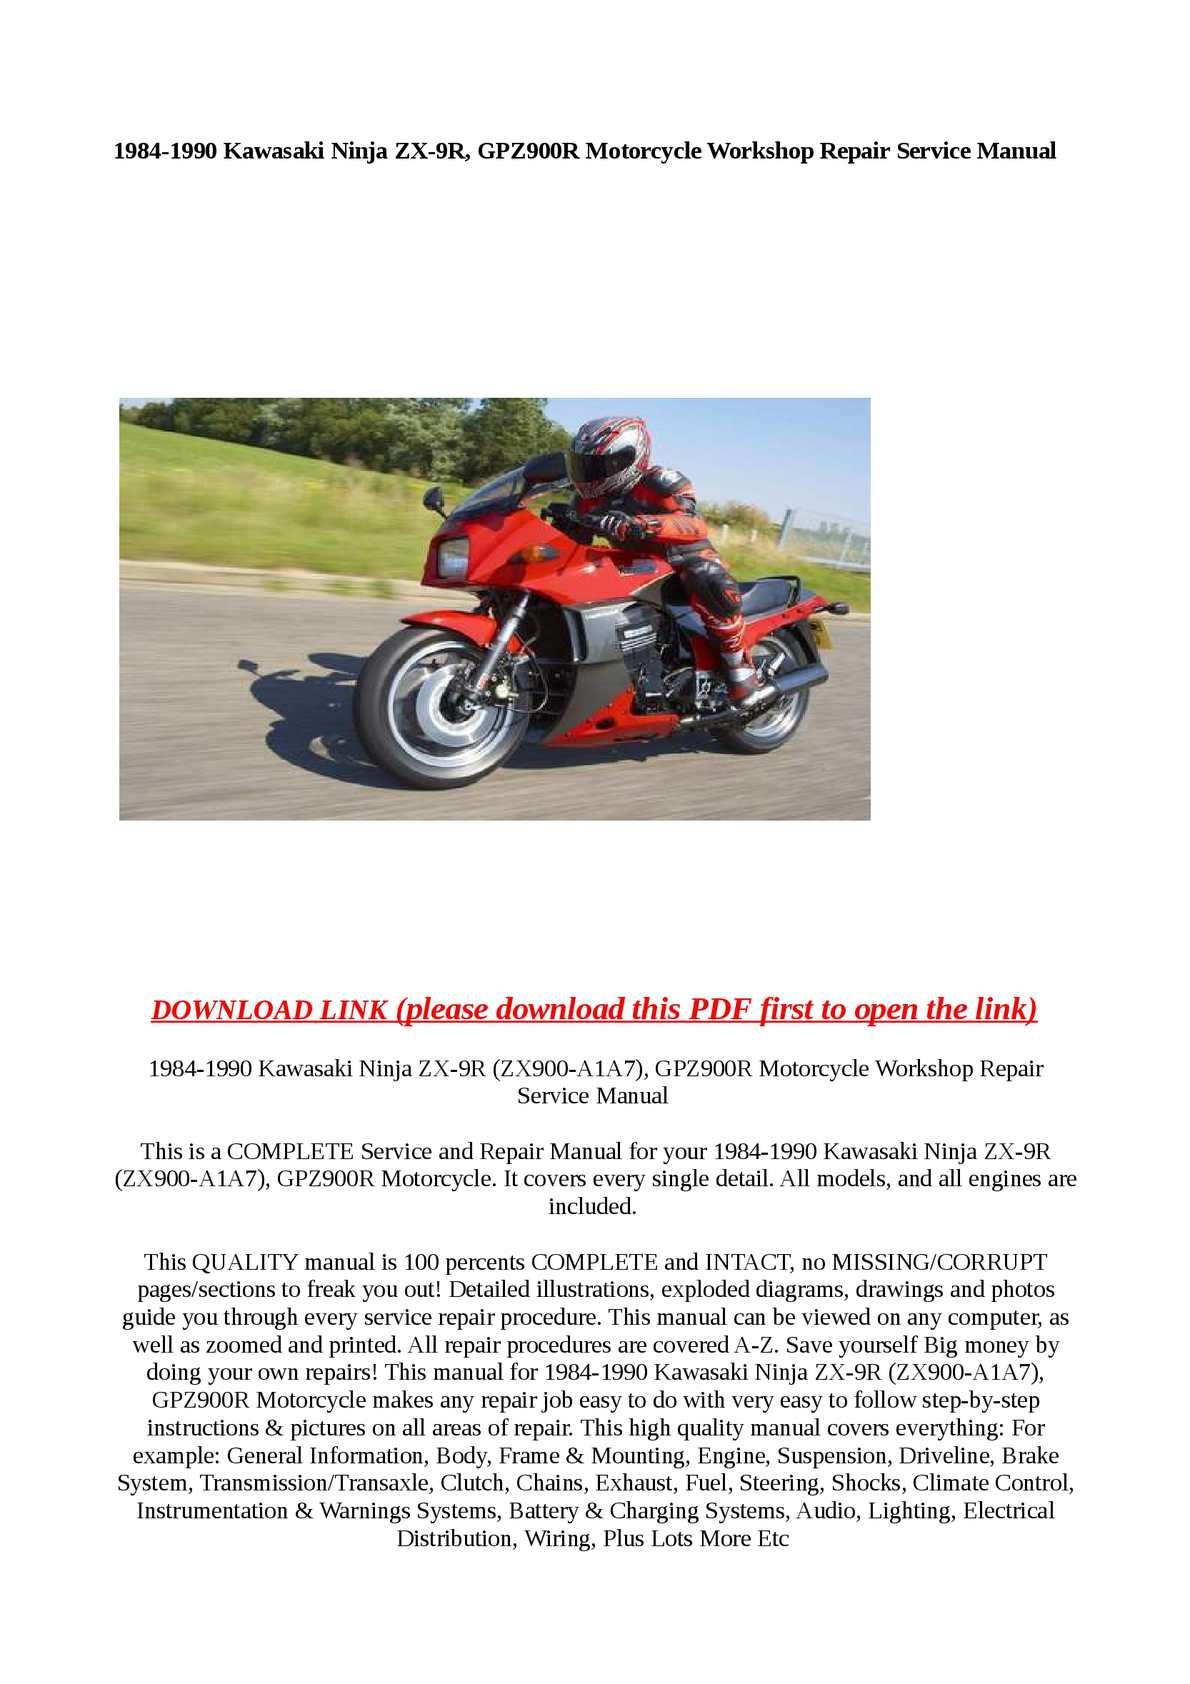 hight resolution of 1984 1990 kawasaki ninja zx 9r gpz900r motorcycle worksh